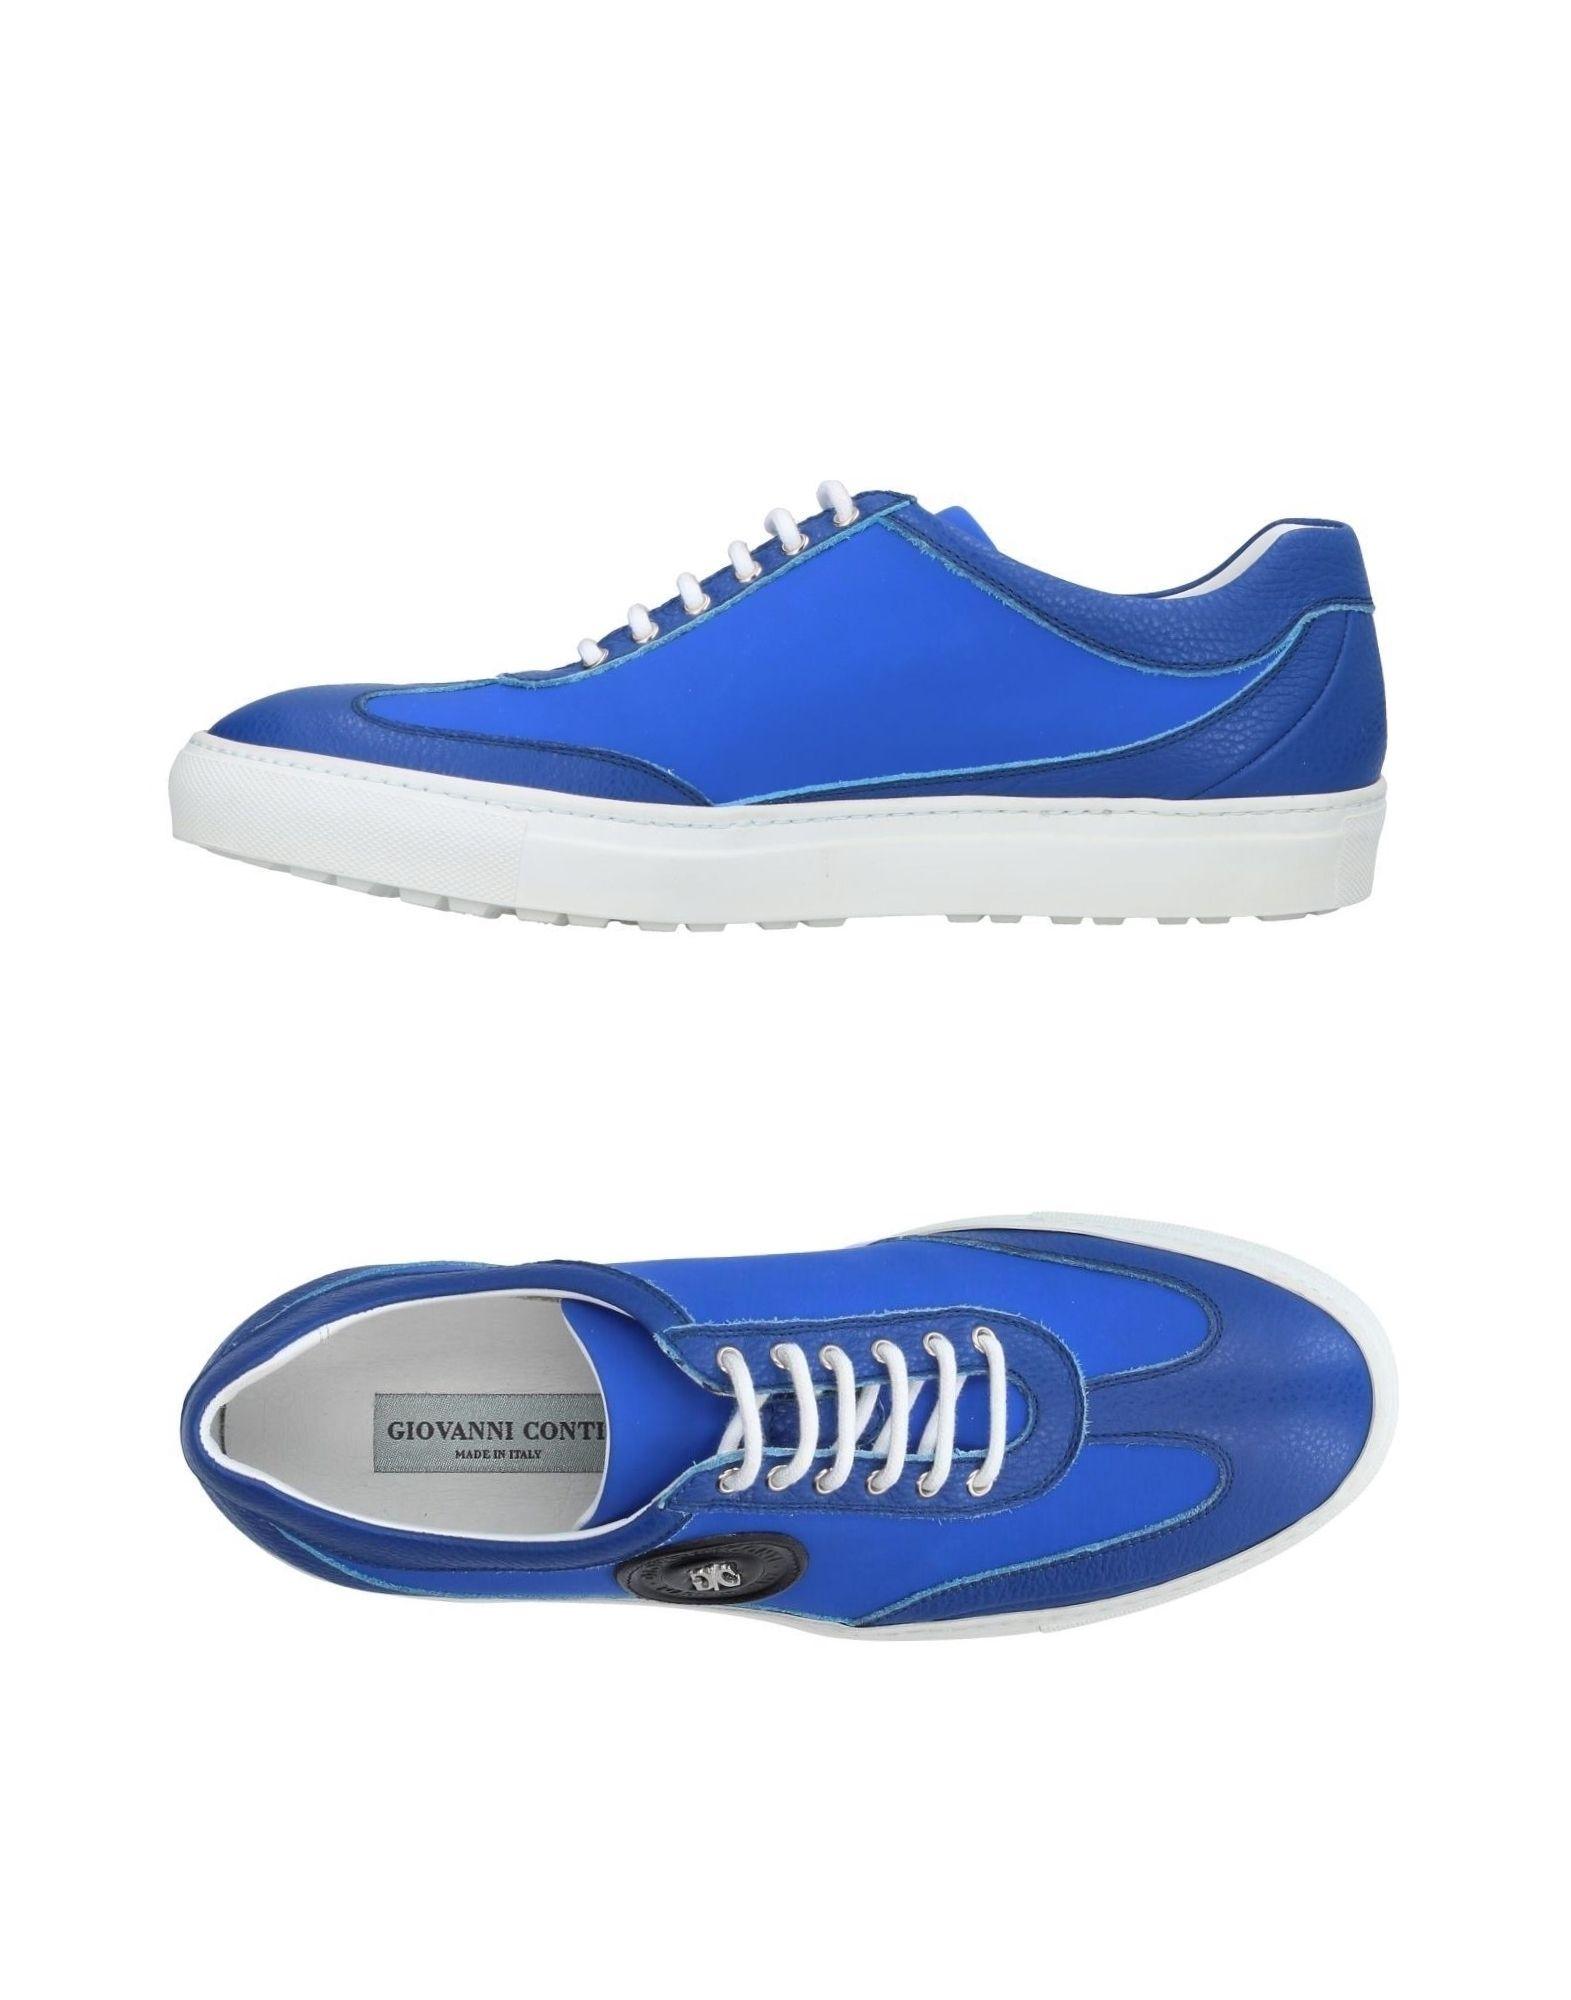 Giovanni Conti Sneakers Herren    11412789TH Neue Schuhe c6a43d